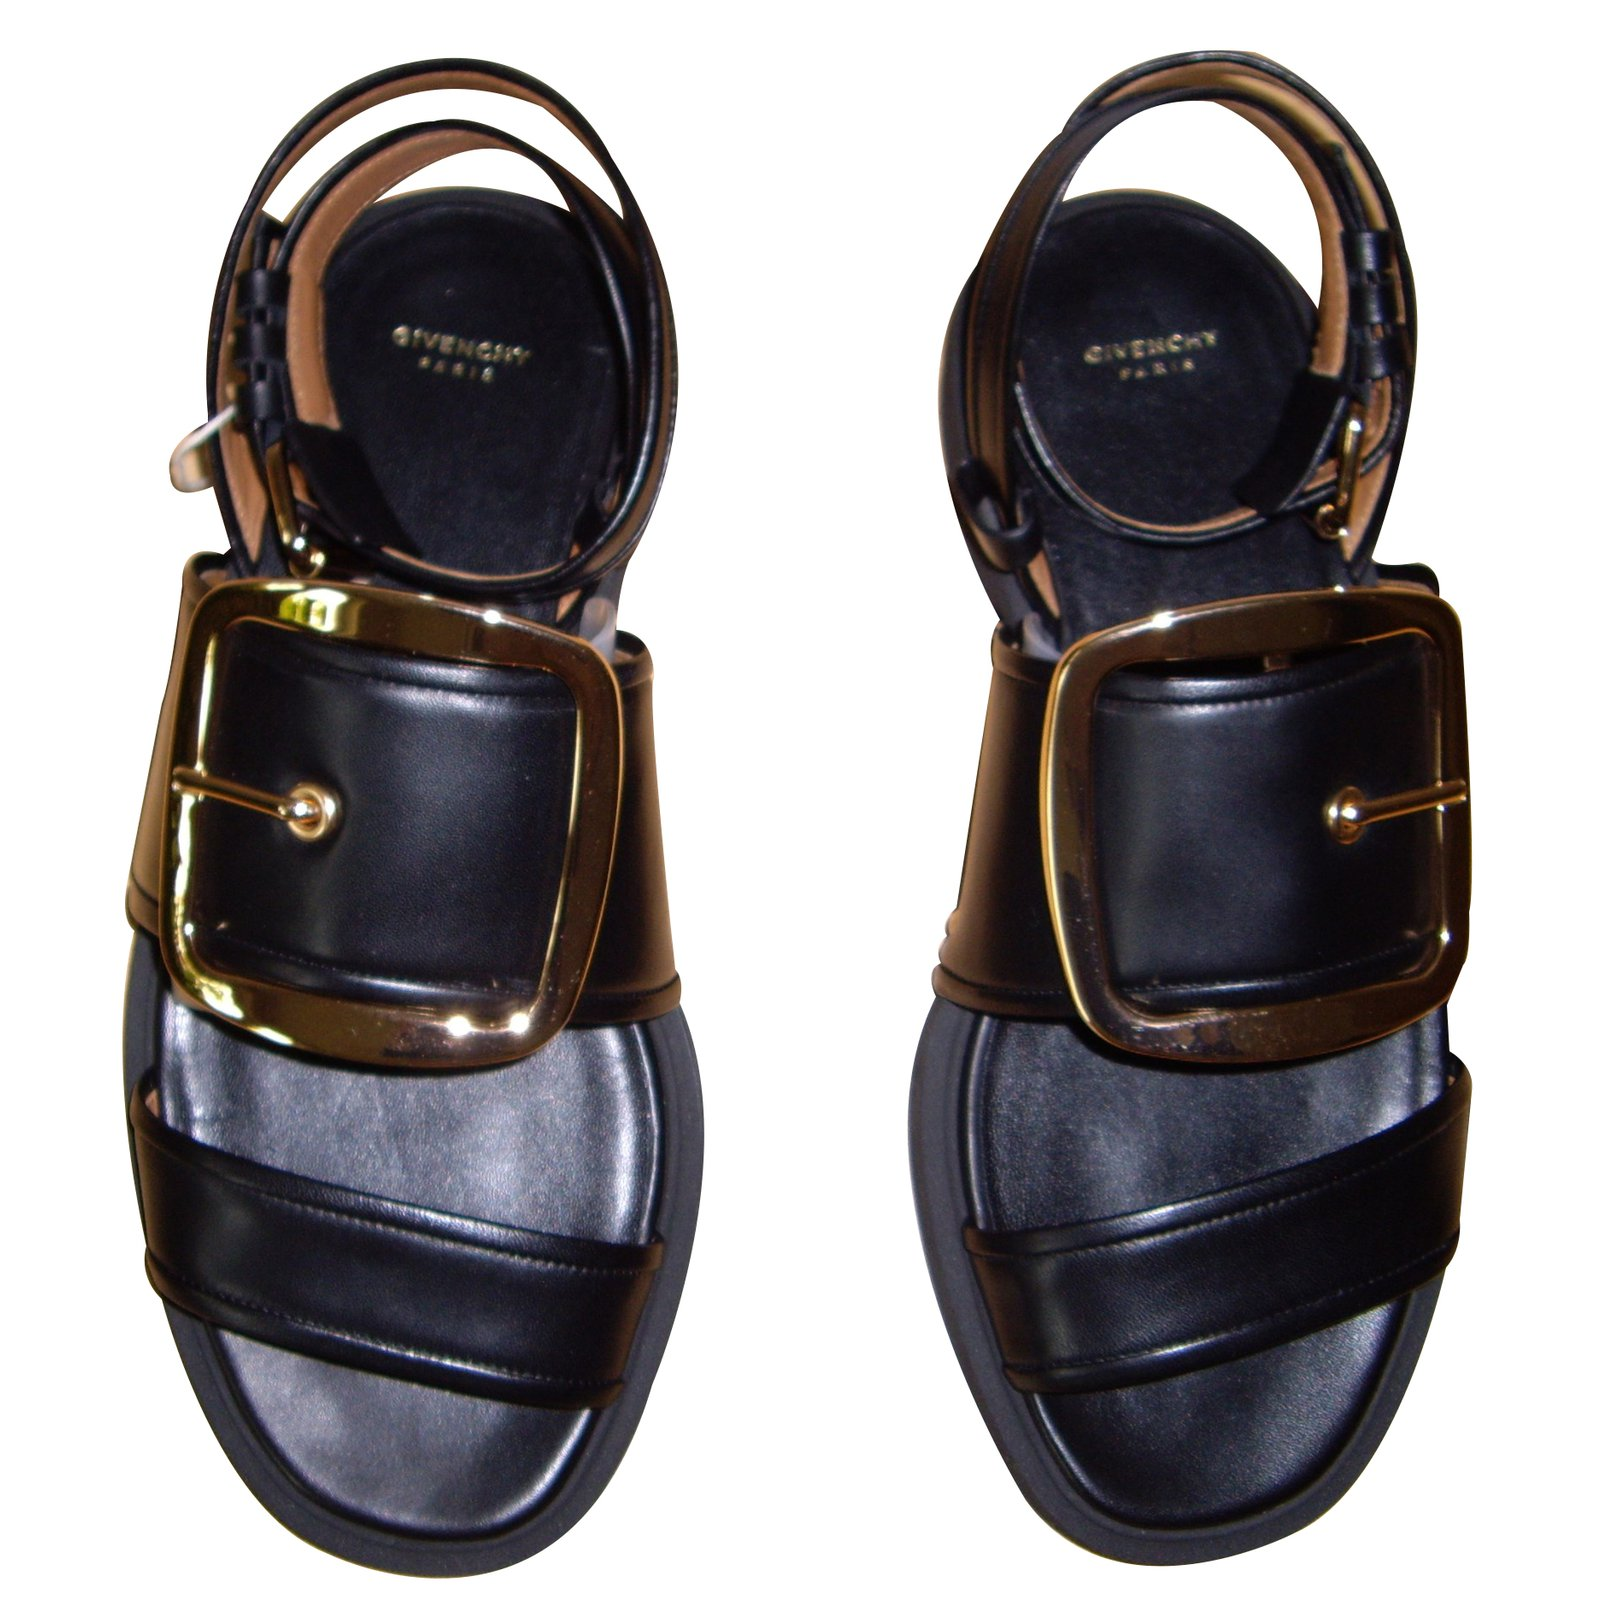 1ac01ee2314 Sandales Givenchy Sandales Cuir Noir ref.16947 - Joli Closet